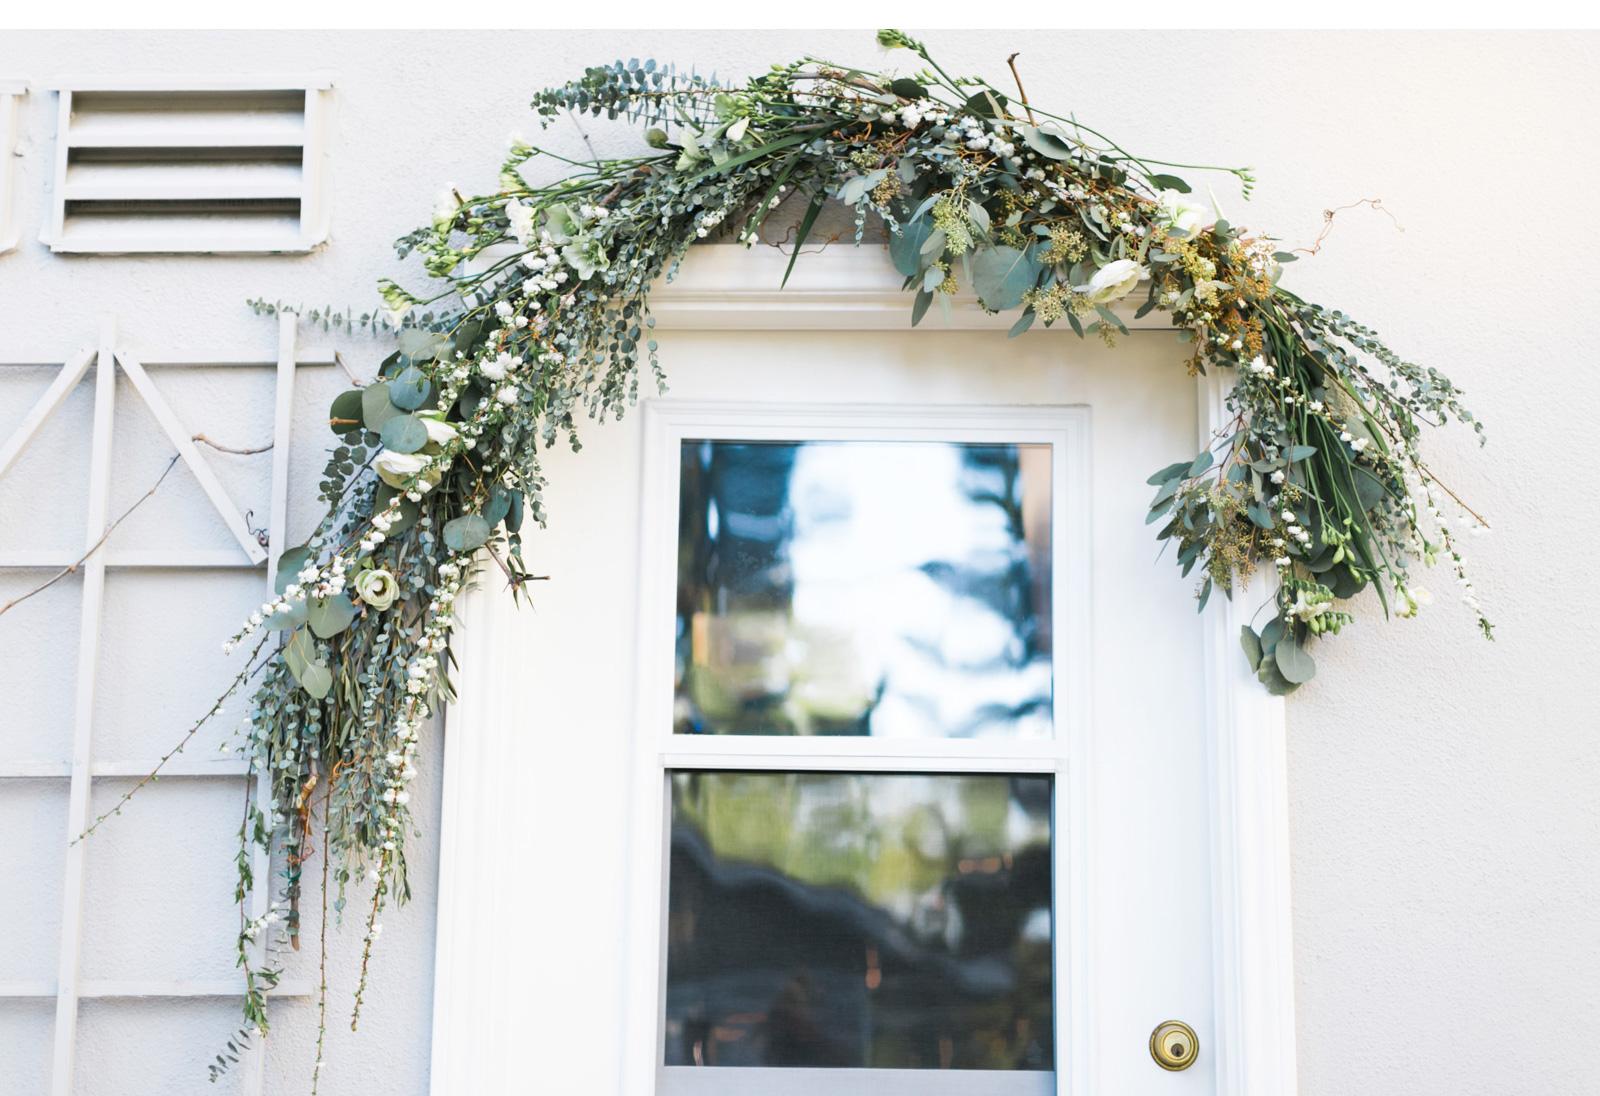 Private-Estate-Backyard-Wedding-Natalie-Schutt-Photography_03.jpg